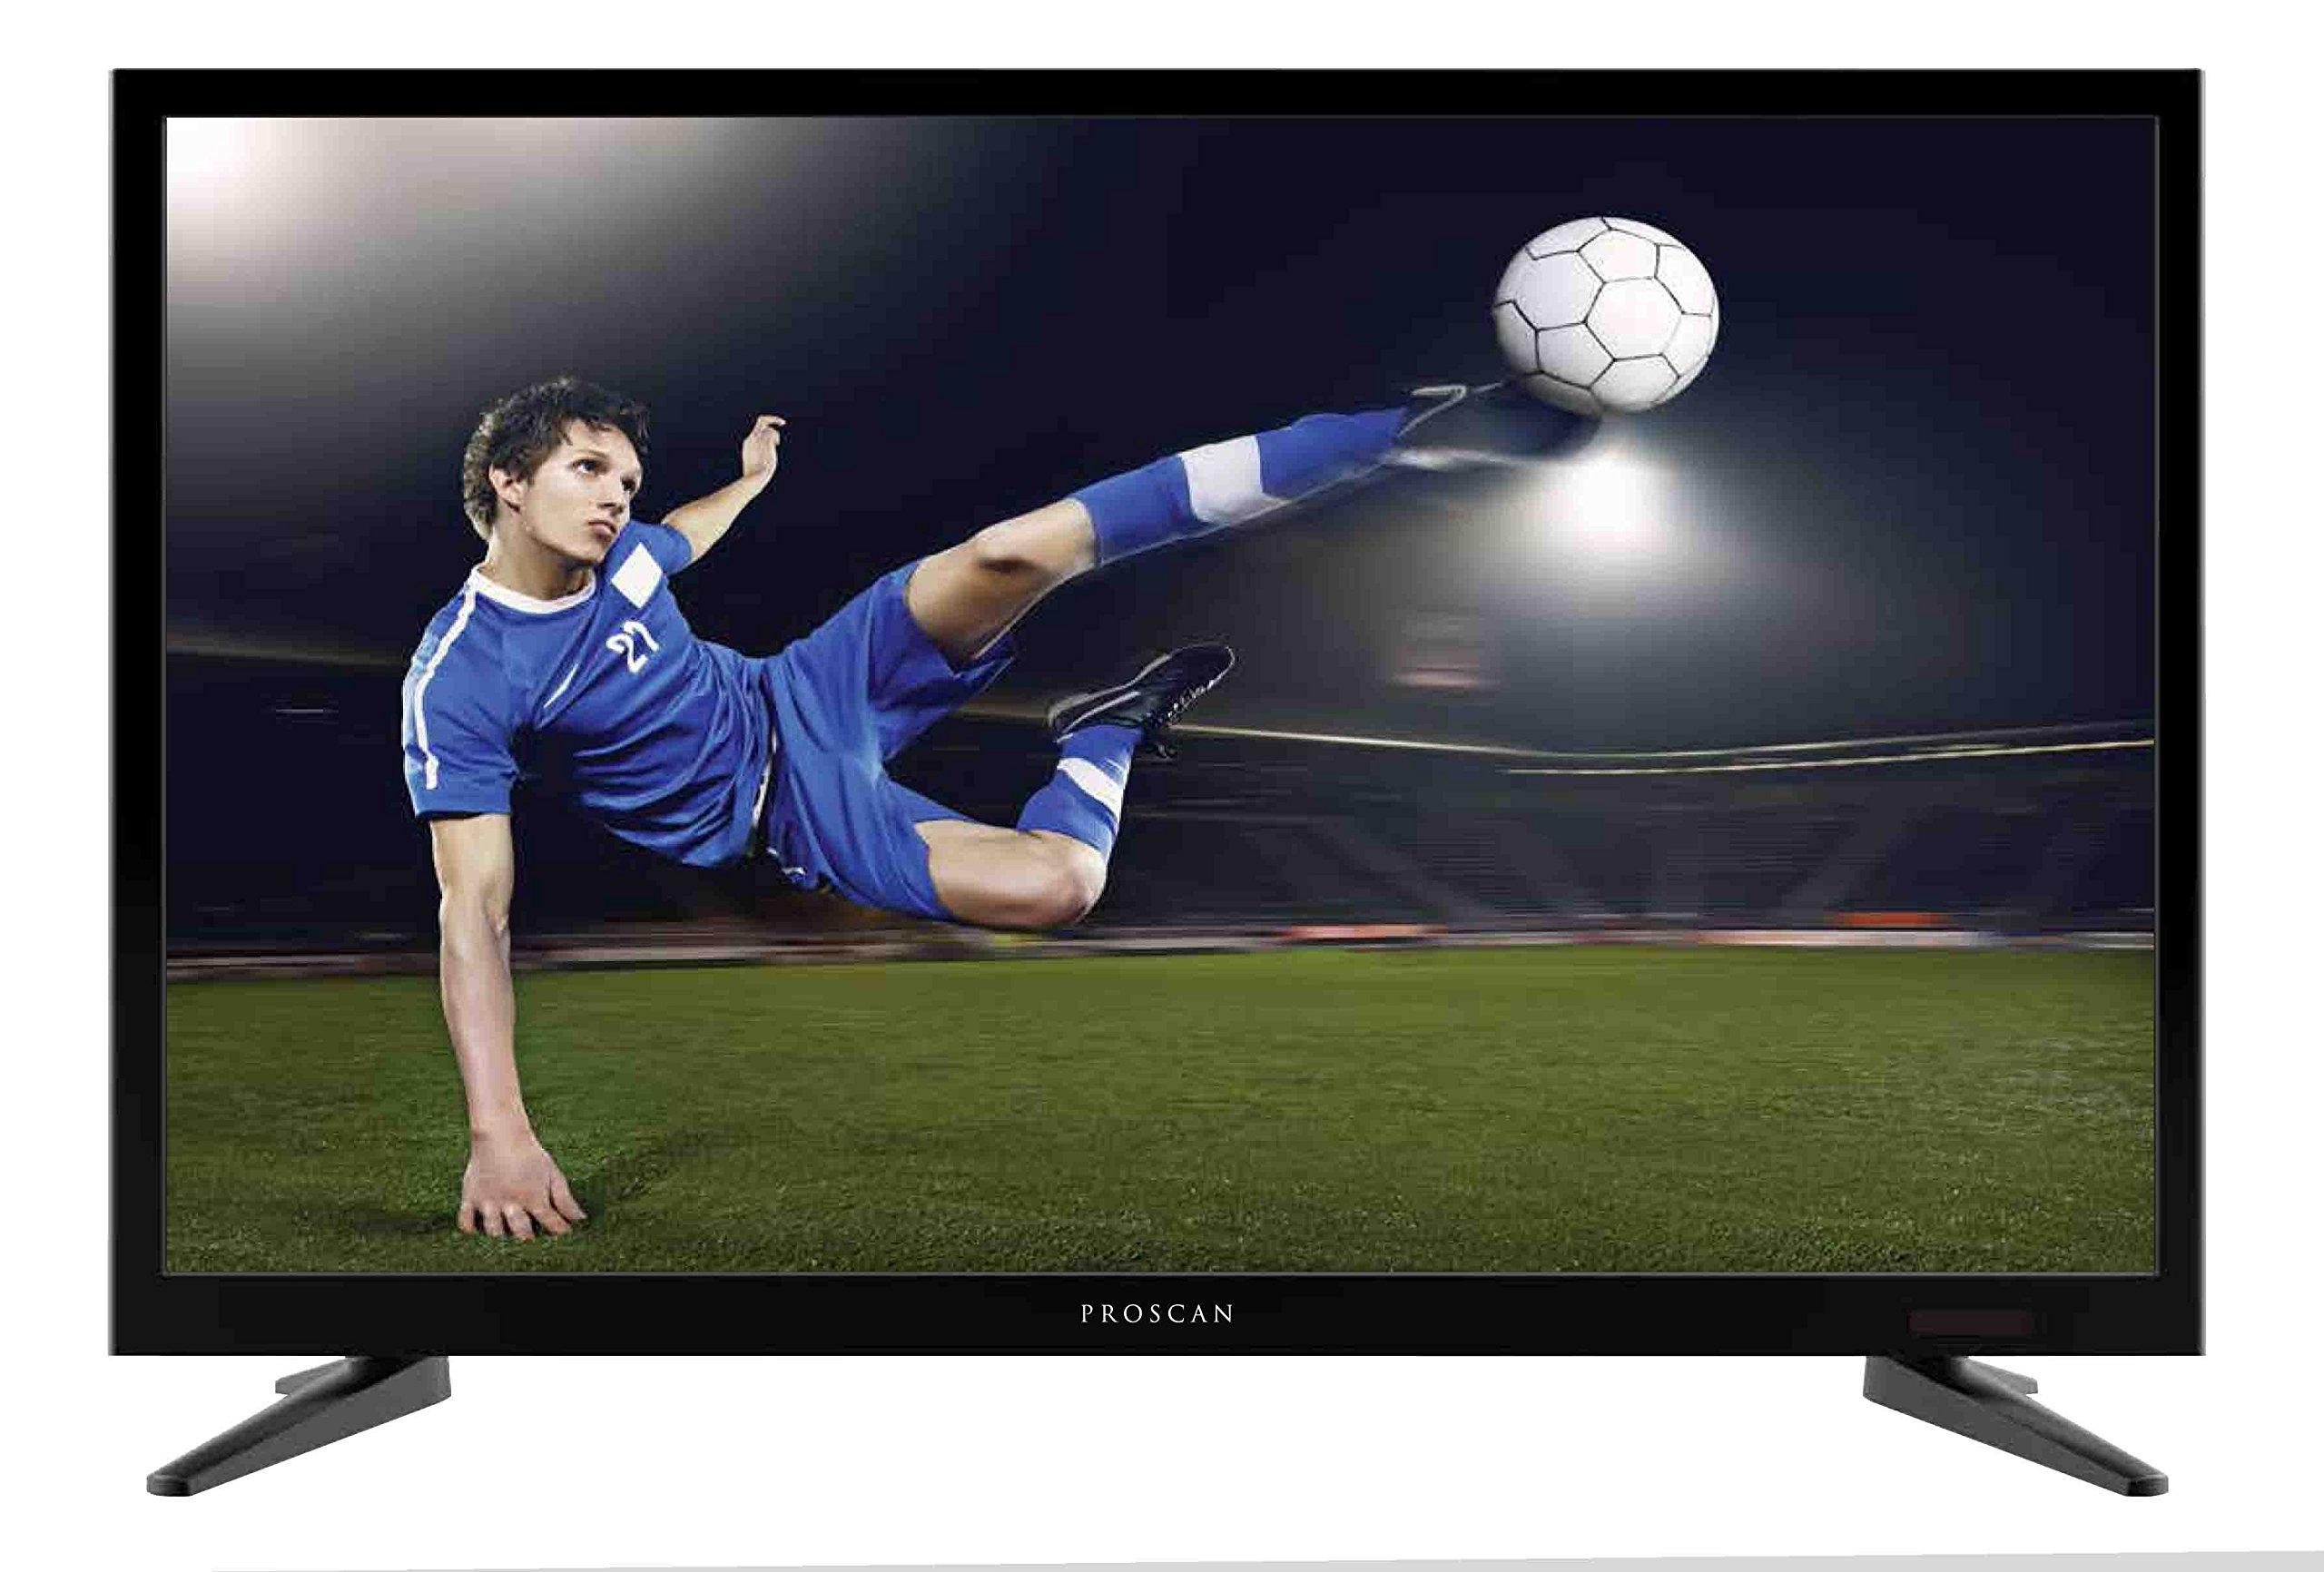 Proscan PLED1960A 19-Inch 720p 60Hz LED TV